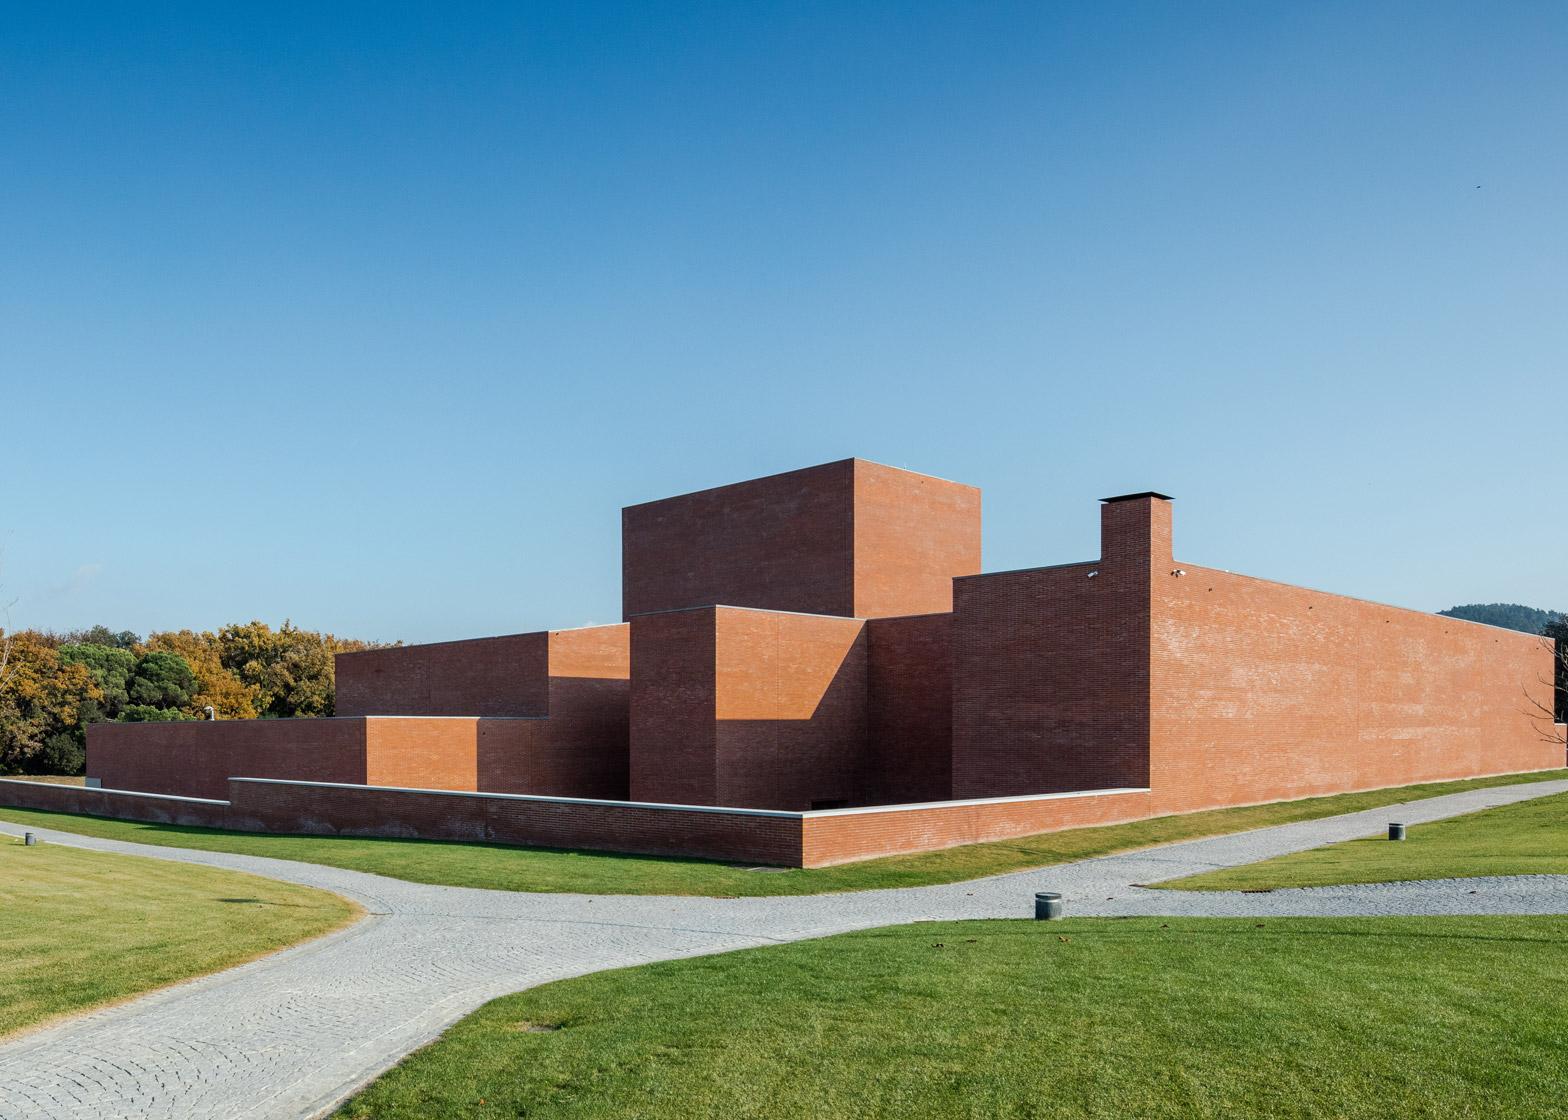 Public Auditorium in Llinars del Vallès by Alvaro Siza Vieira